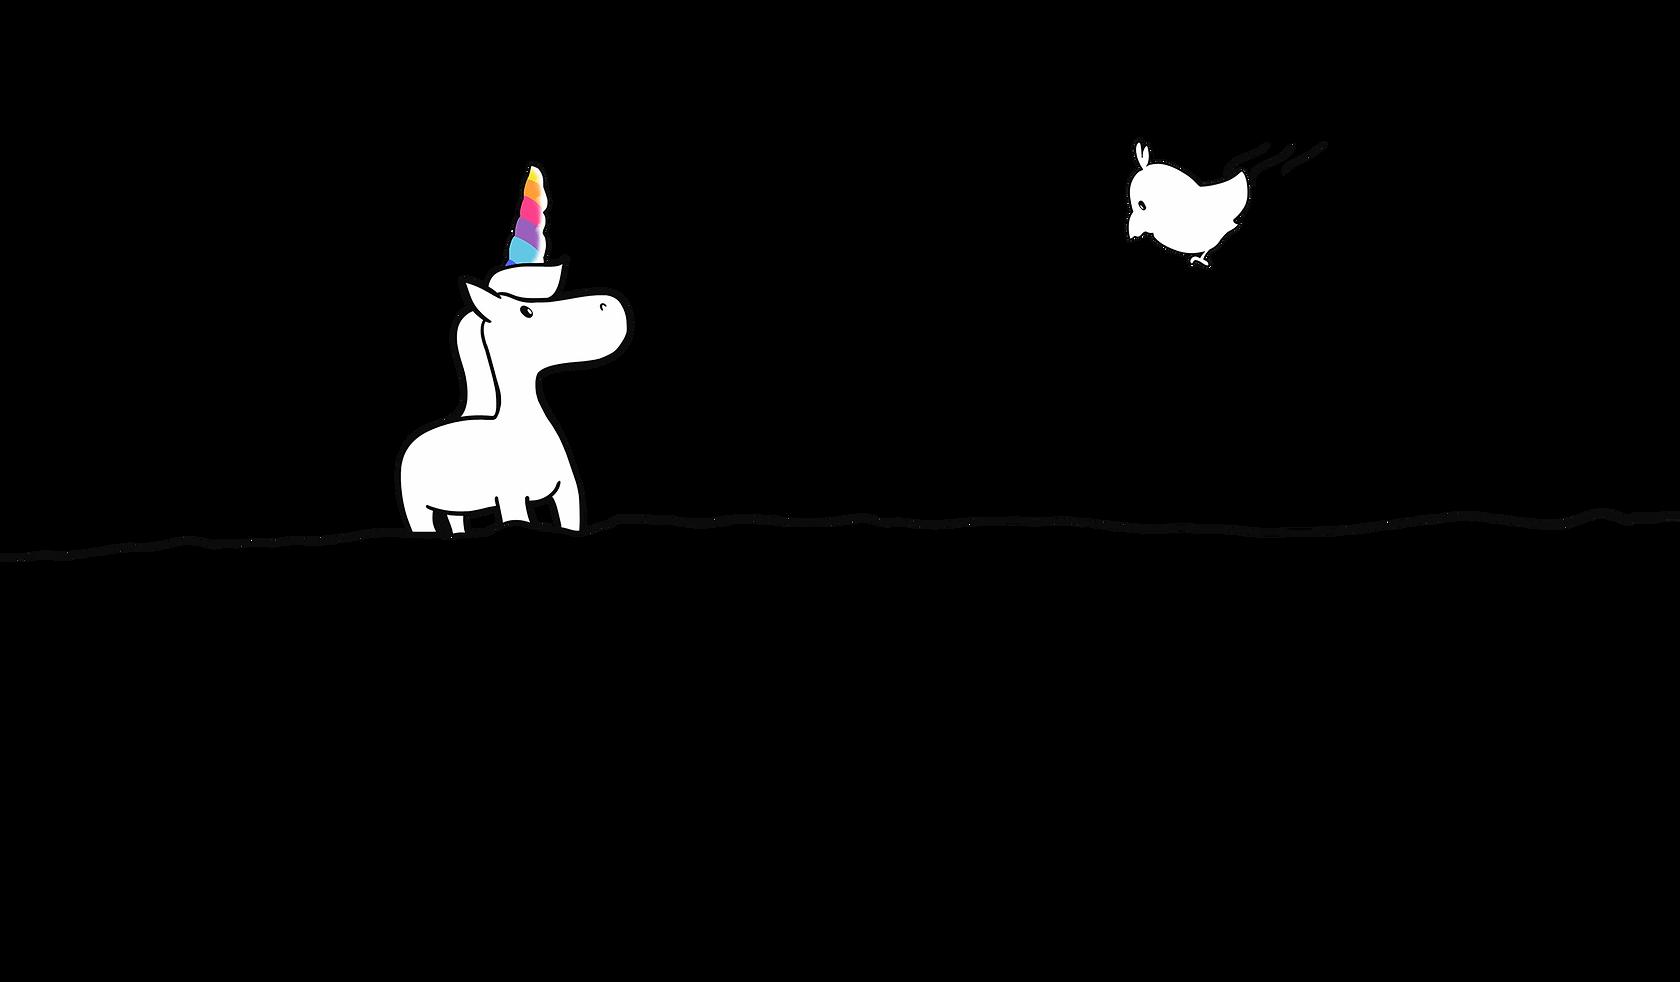 unicorn 2 (1)-min.png